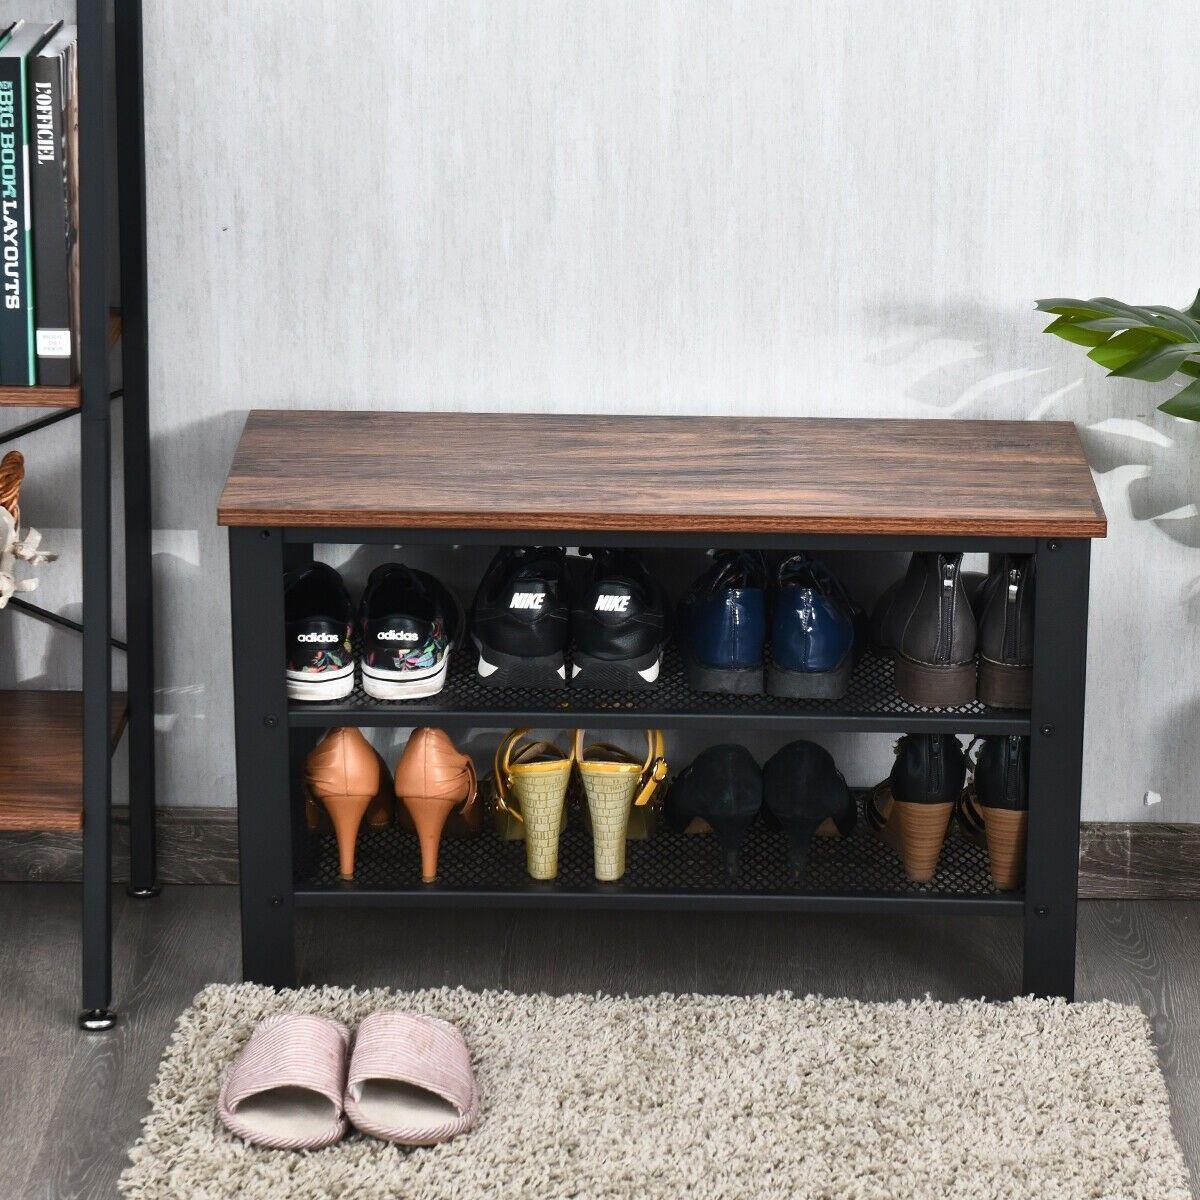 3 Tier Shoe Rack Industrial Shoe Bench With Storage Shelves Shoe Storage Bench Entryway Shoe Bench Shoe Storage Bench With Doors